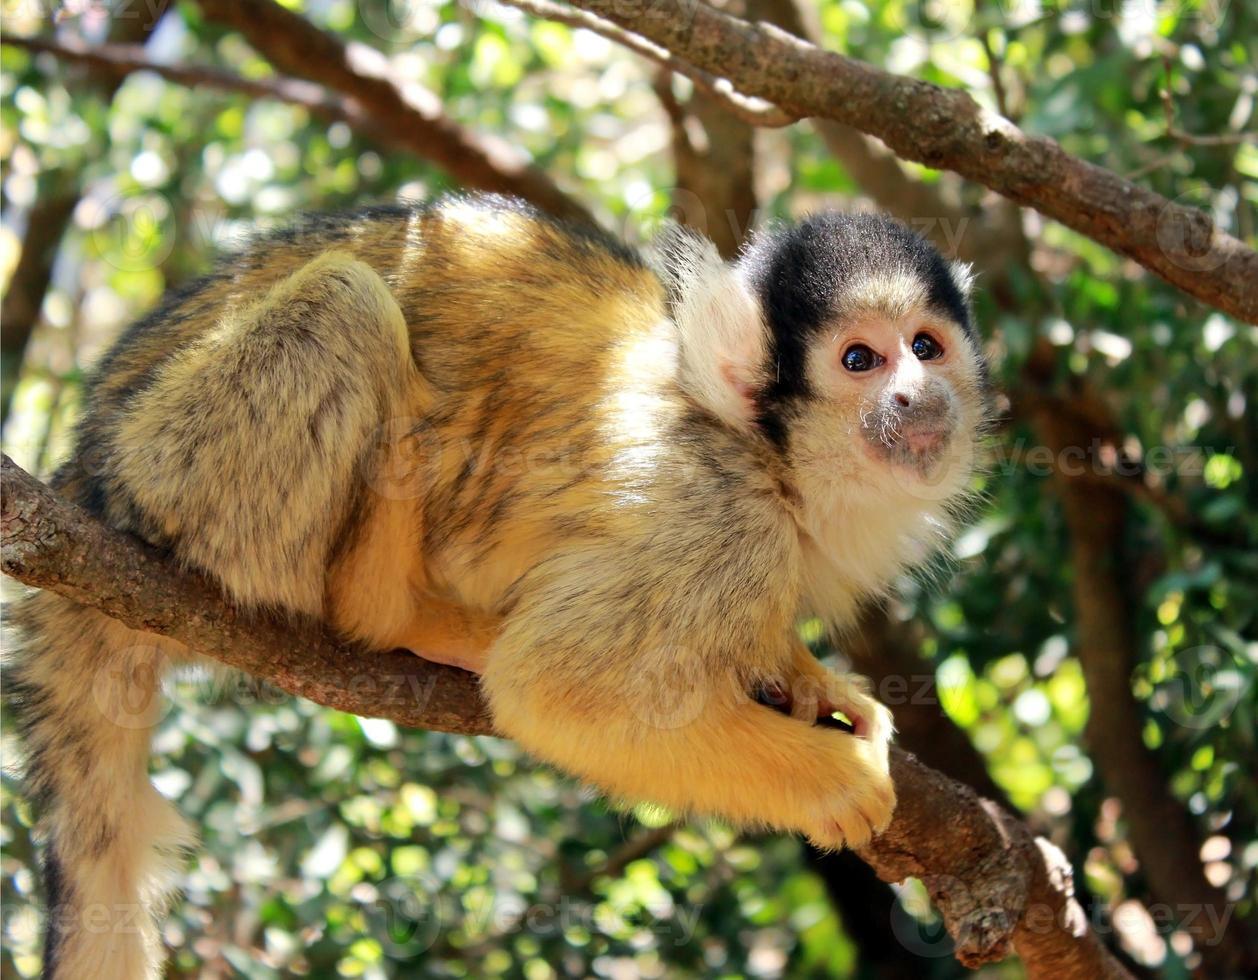 cute squirrel monkey photo